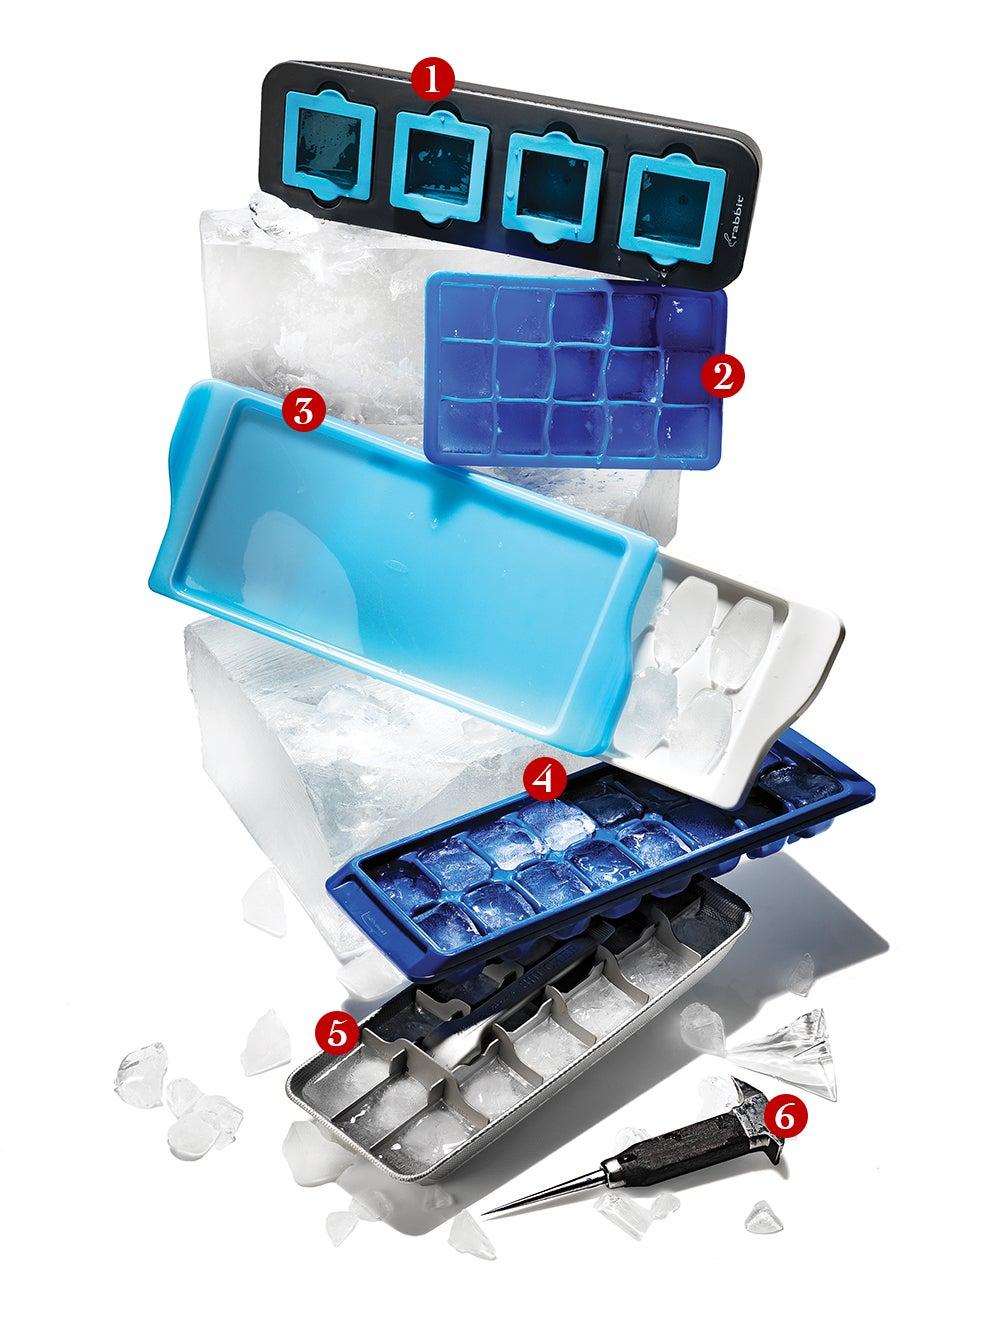 On the origin of ice trays